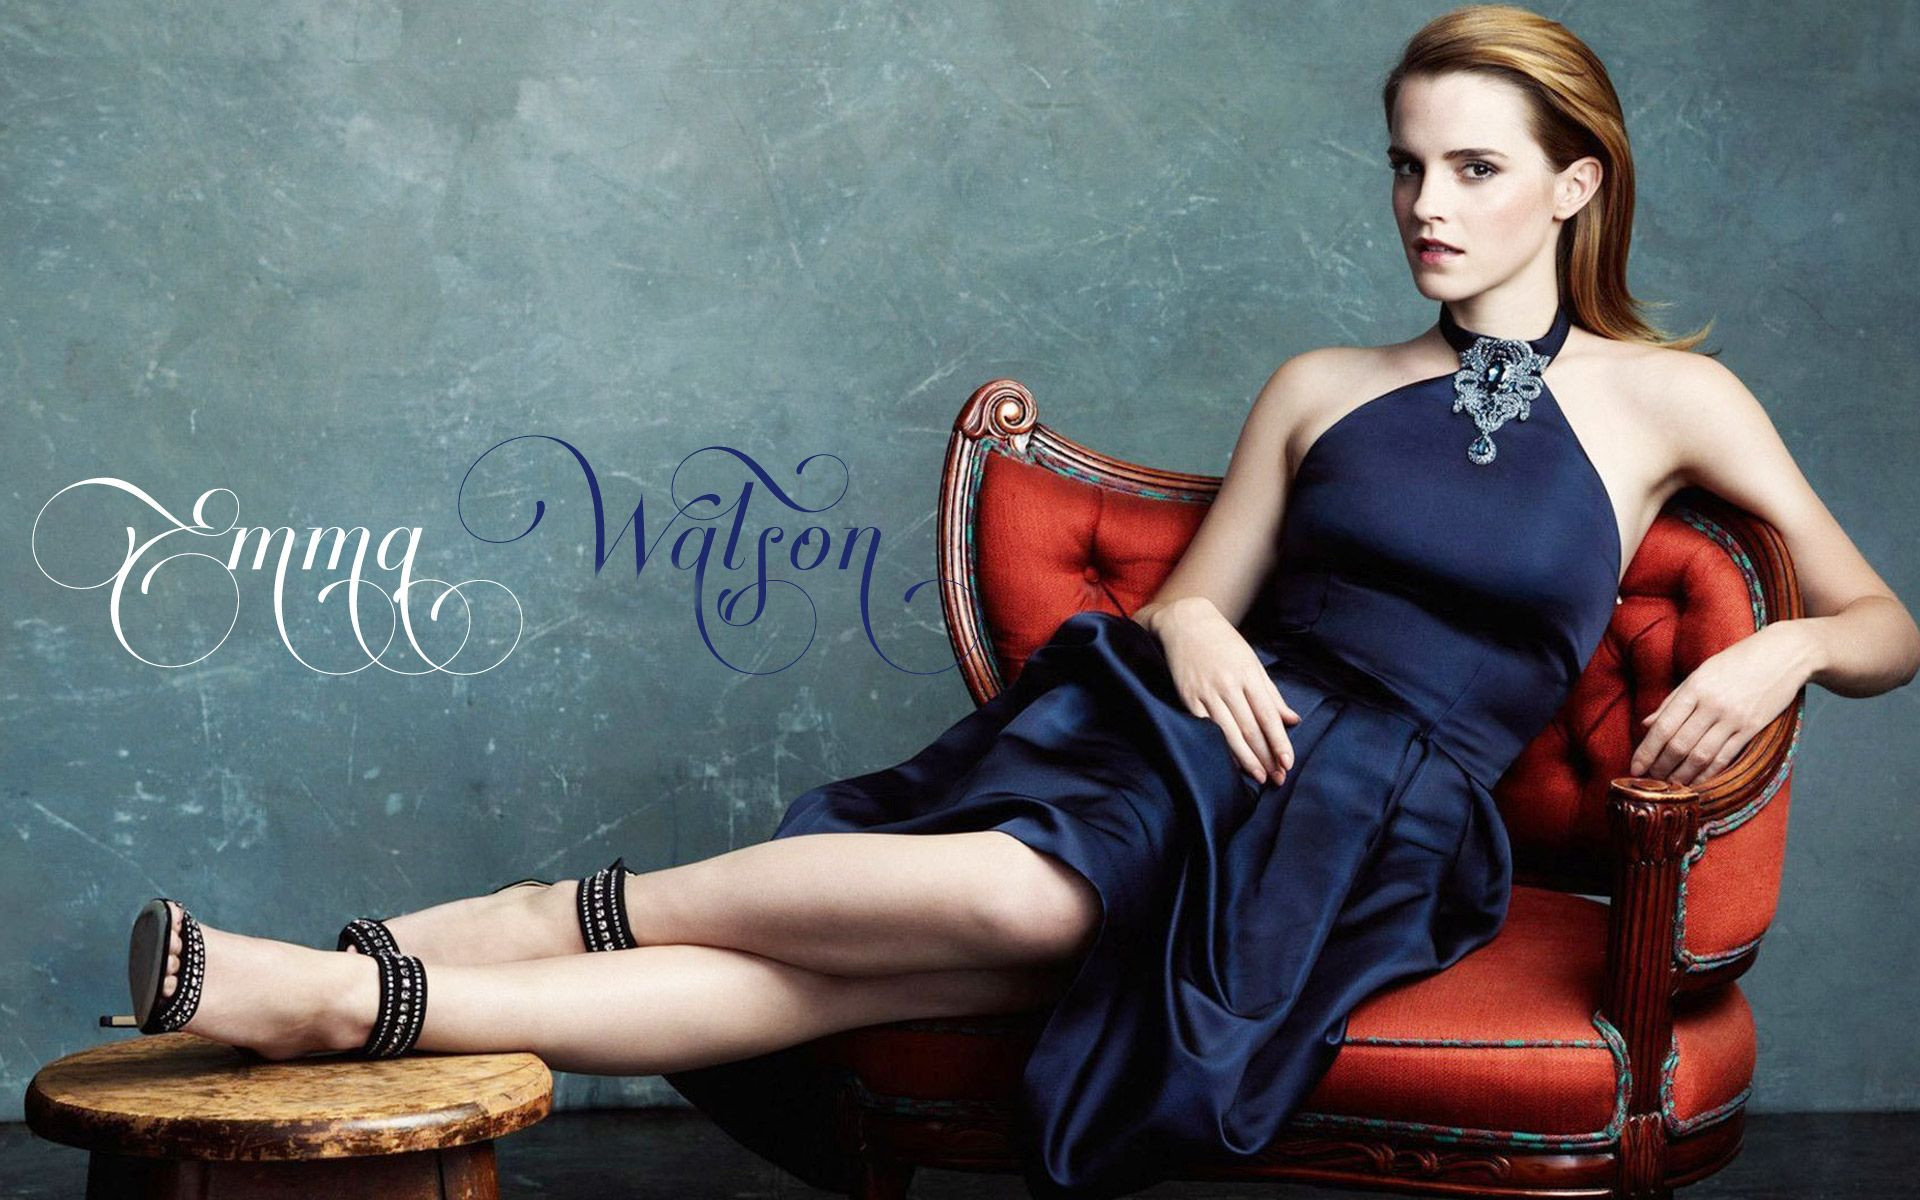 Google themes emma watson - Emma Watson New Hot Look Wallpapers Free Download Available At Hdwallpapersz Net Google Chrome Themesemma